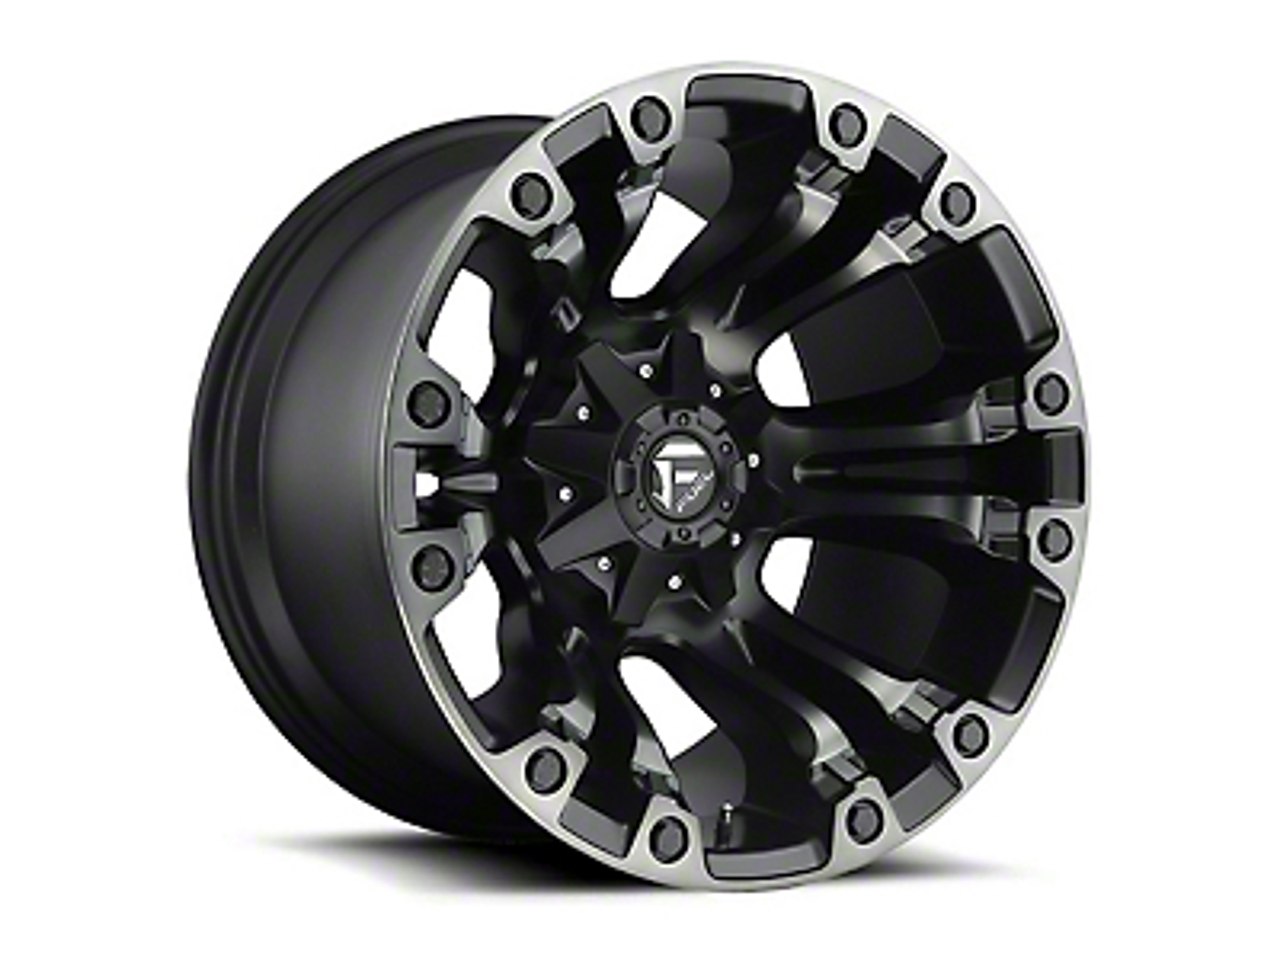 Fuel Wheels Vapor Matte Black Machined Wheel - 15x8 (87-06 Wrangler YJ & TJ)